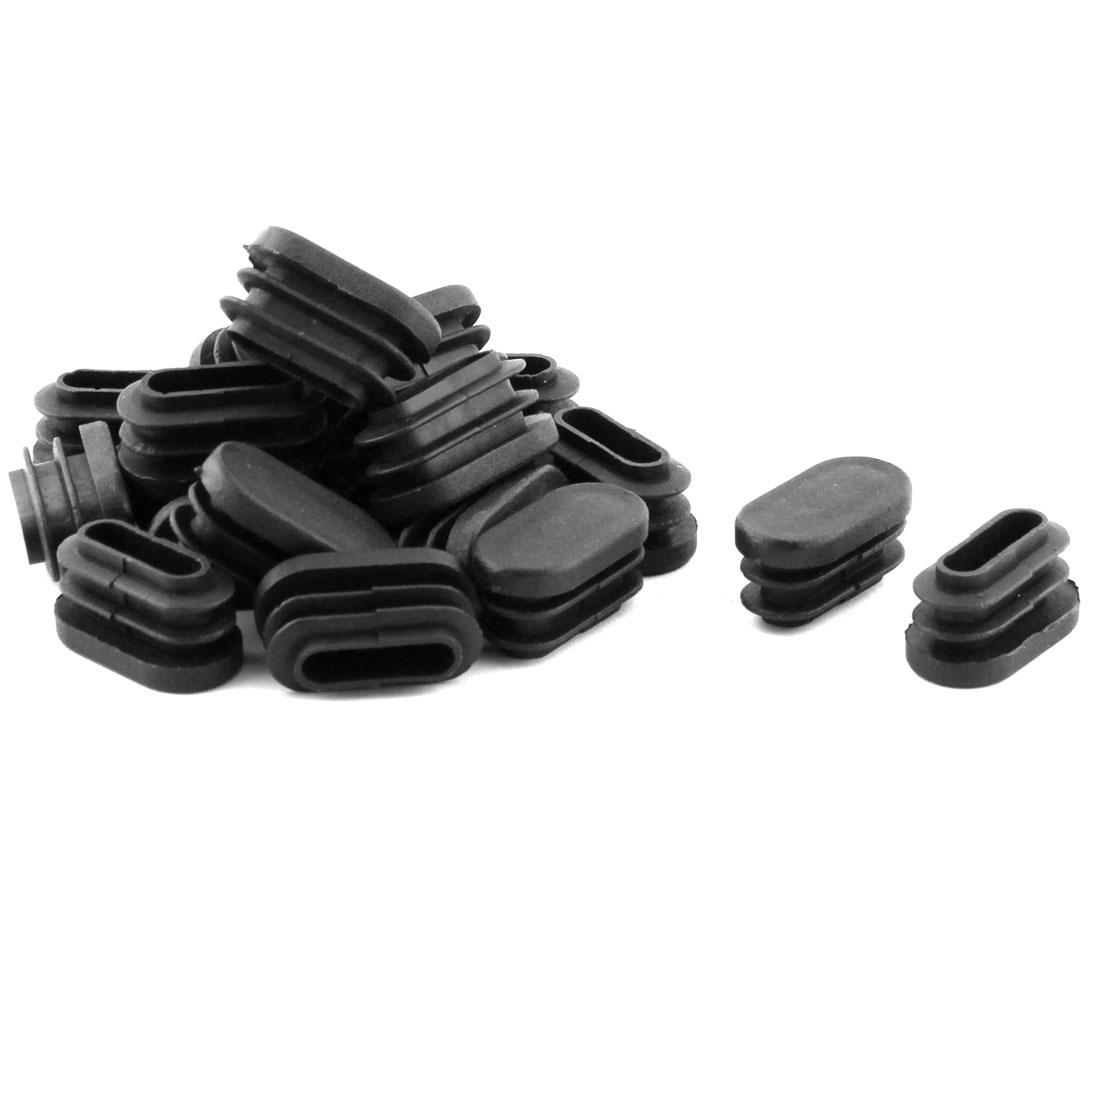 Desk Feet Legs Plastic Oval Shaped Tube Pipe Inserts End Caps Black 20 PCS